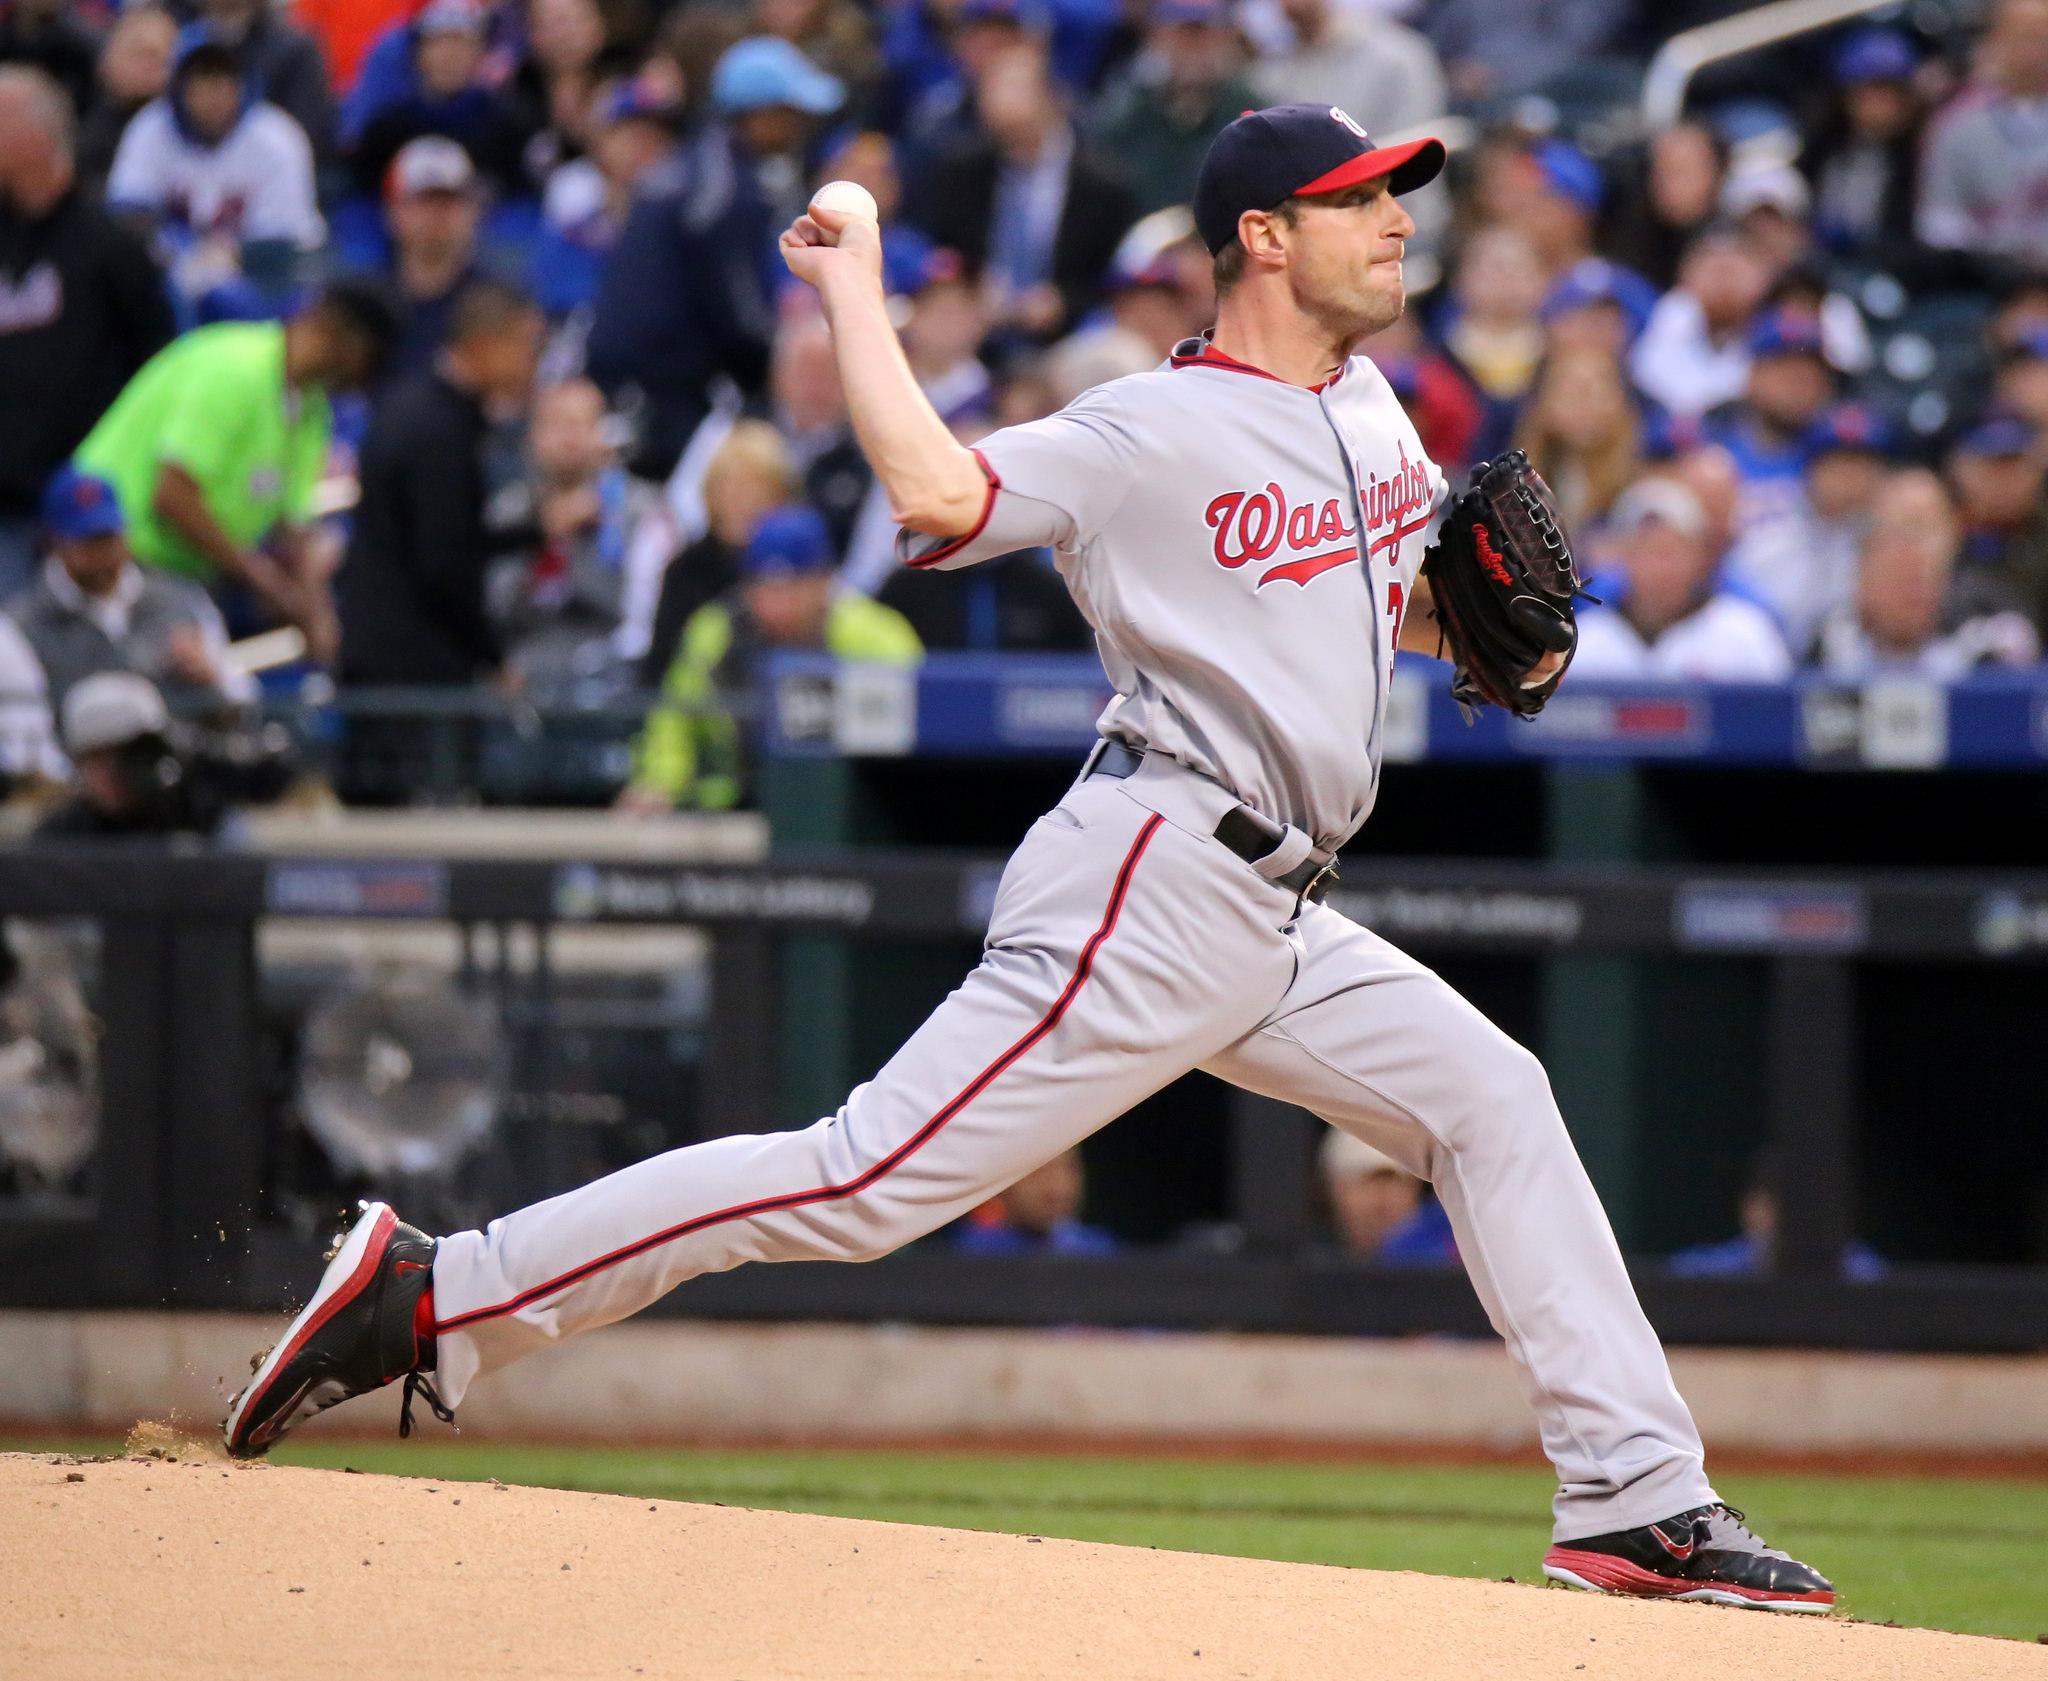 Washington Nationals pitcher Max Scherzer on May 17, 2016. Arturo Pardavila III/Flickr (Creative Commons)